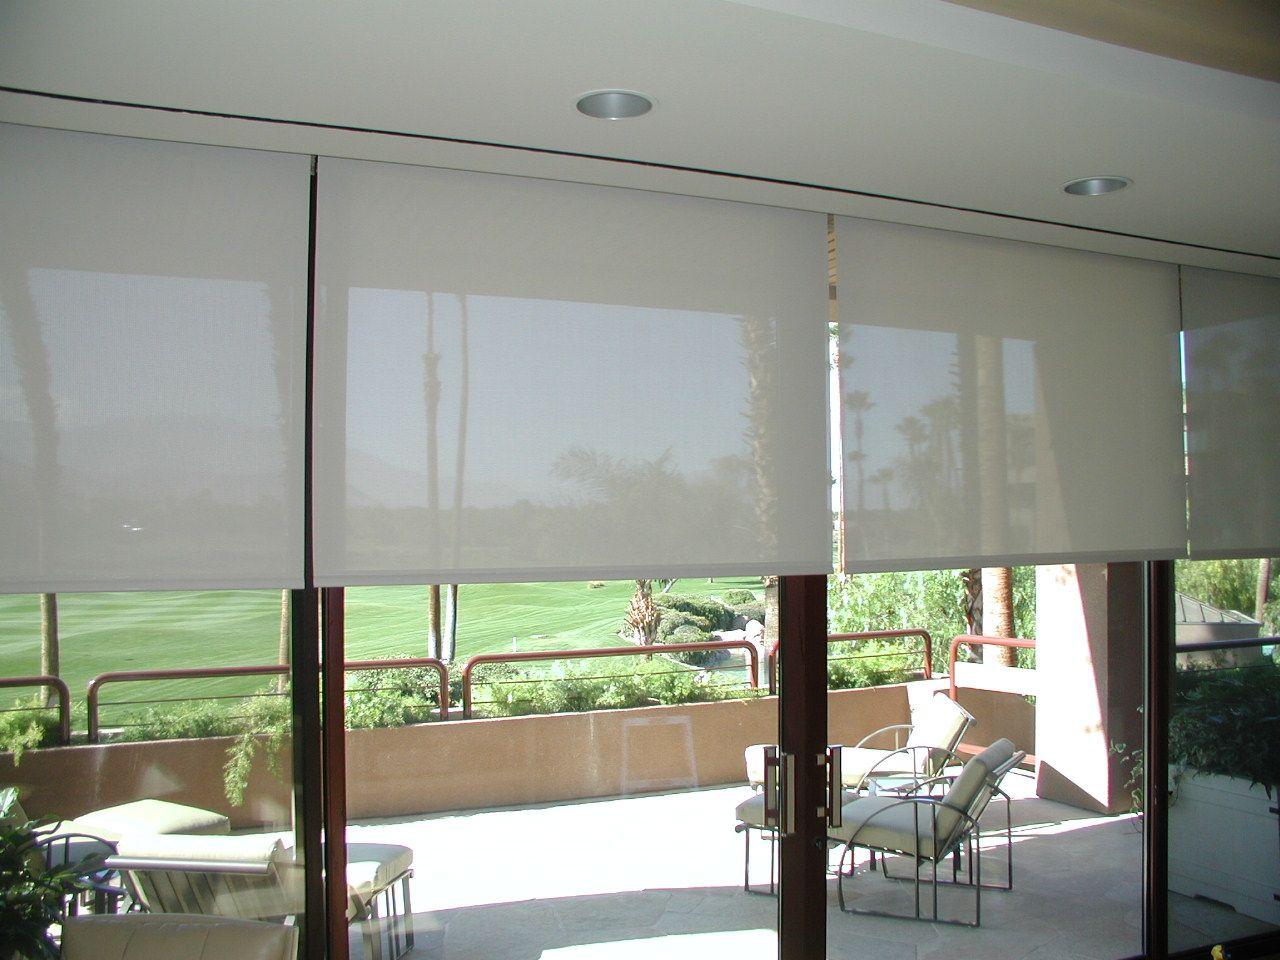 Top Roll Up Shades For Your Home Patio Door Shades Patio Door